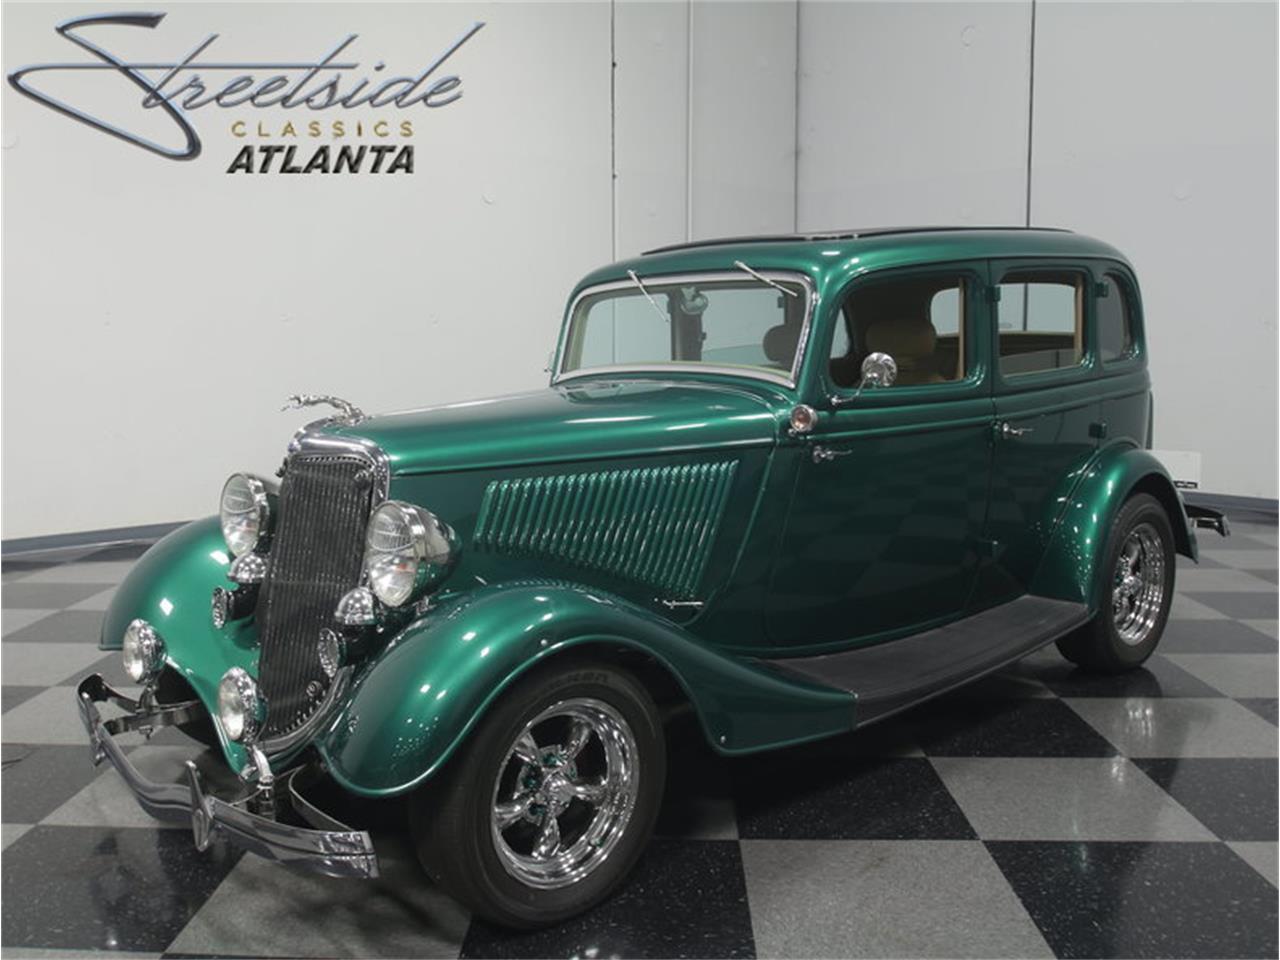 For Sale: 1934 Ford Sedan Restomod in Lithia Springs, Georgia